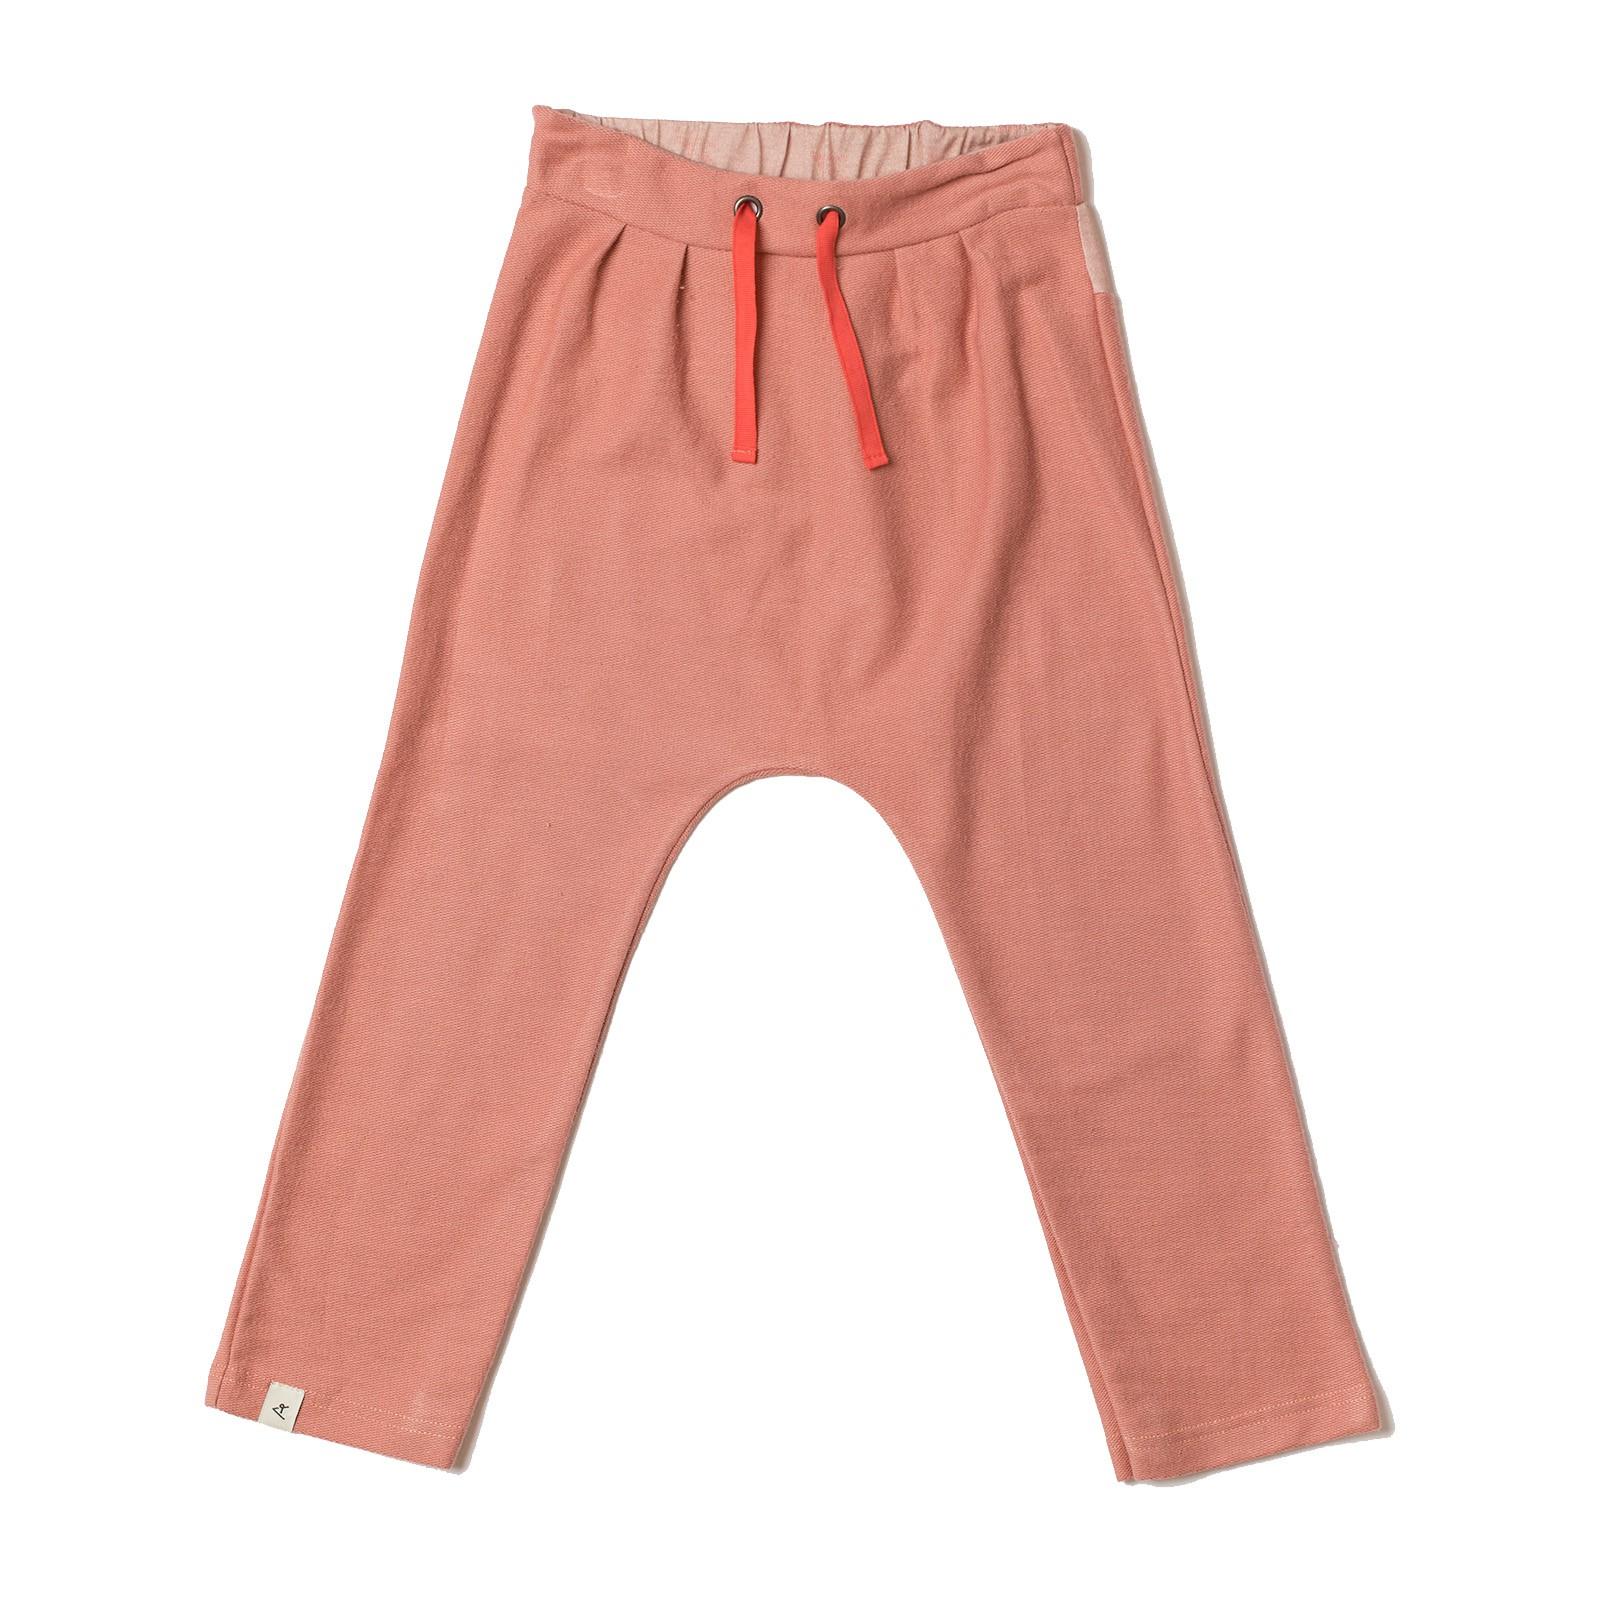 Iryna pants